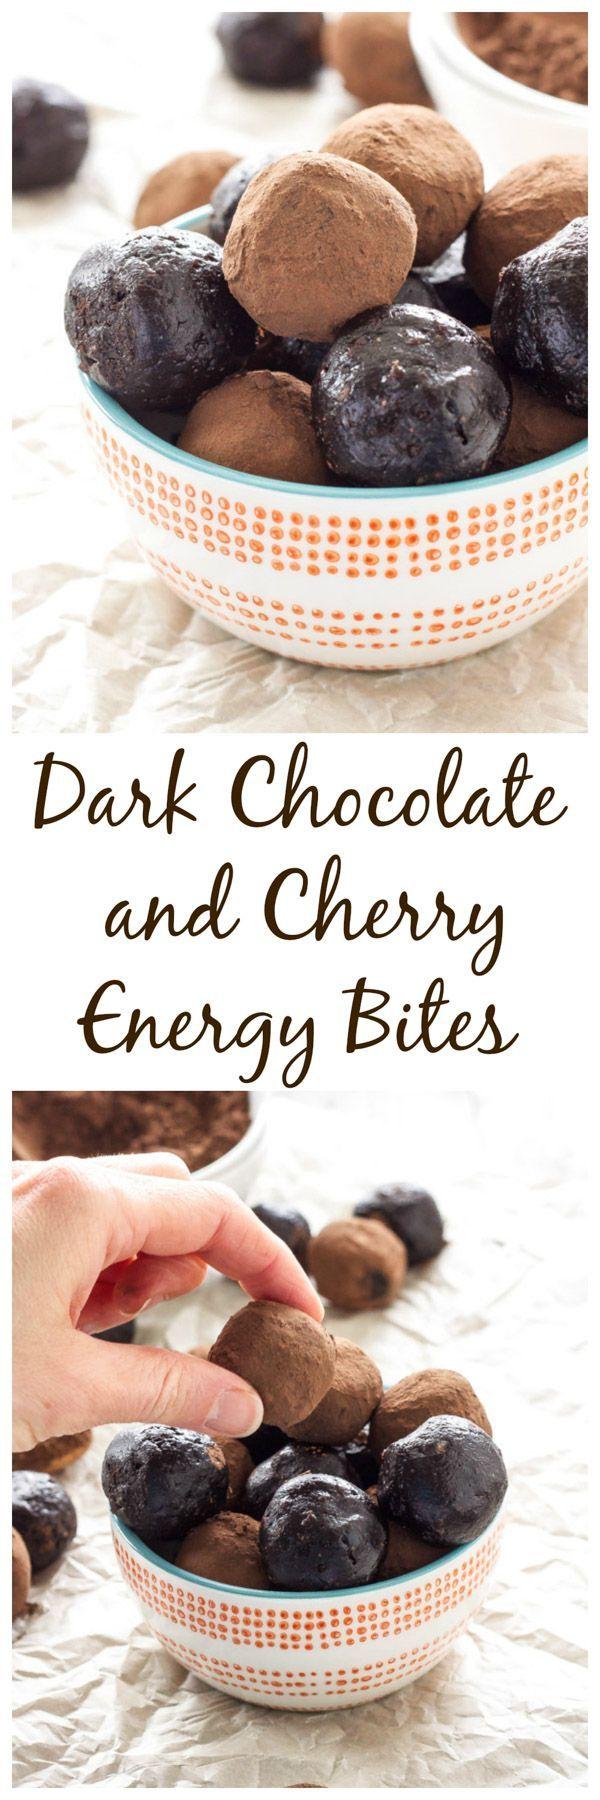 Dark Chocolate and Cherry Energy Bites | Vegan, gluten free, and paleo energy bites that taste just like brownie batter! | www.reciperunner.com